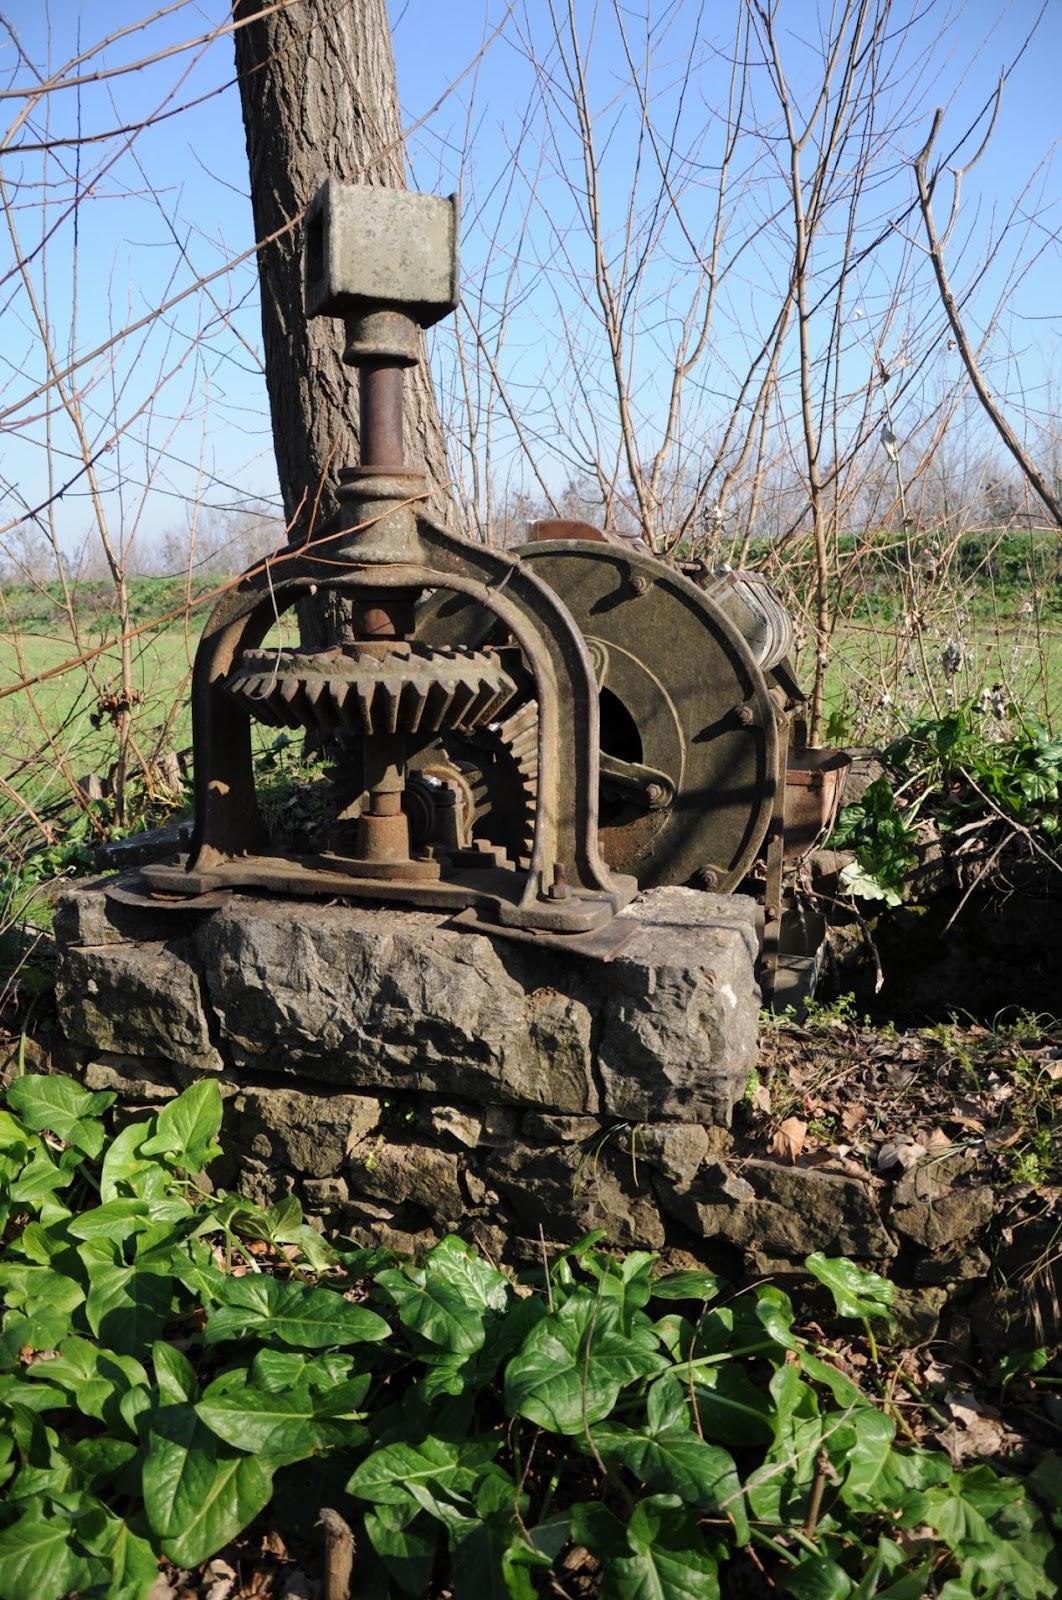 D:\ΕΞΟΡΜΗΣΕΙΣ- ΤΑΞΙΔΙΑ\ΕΚΤΟΣ ΛΗΜΝΟΥ\Karditsa 2011\DSC_0429.JPG